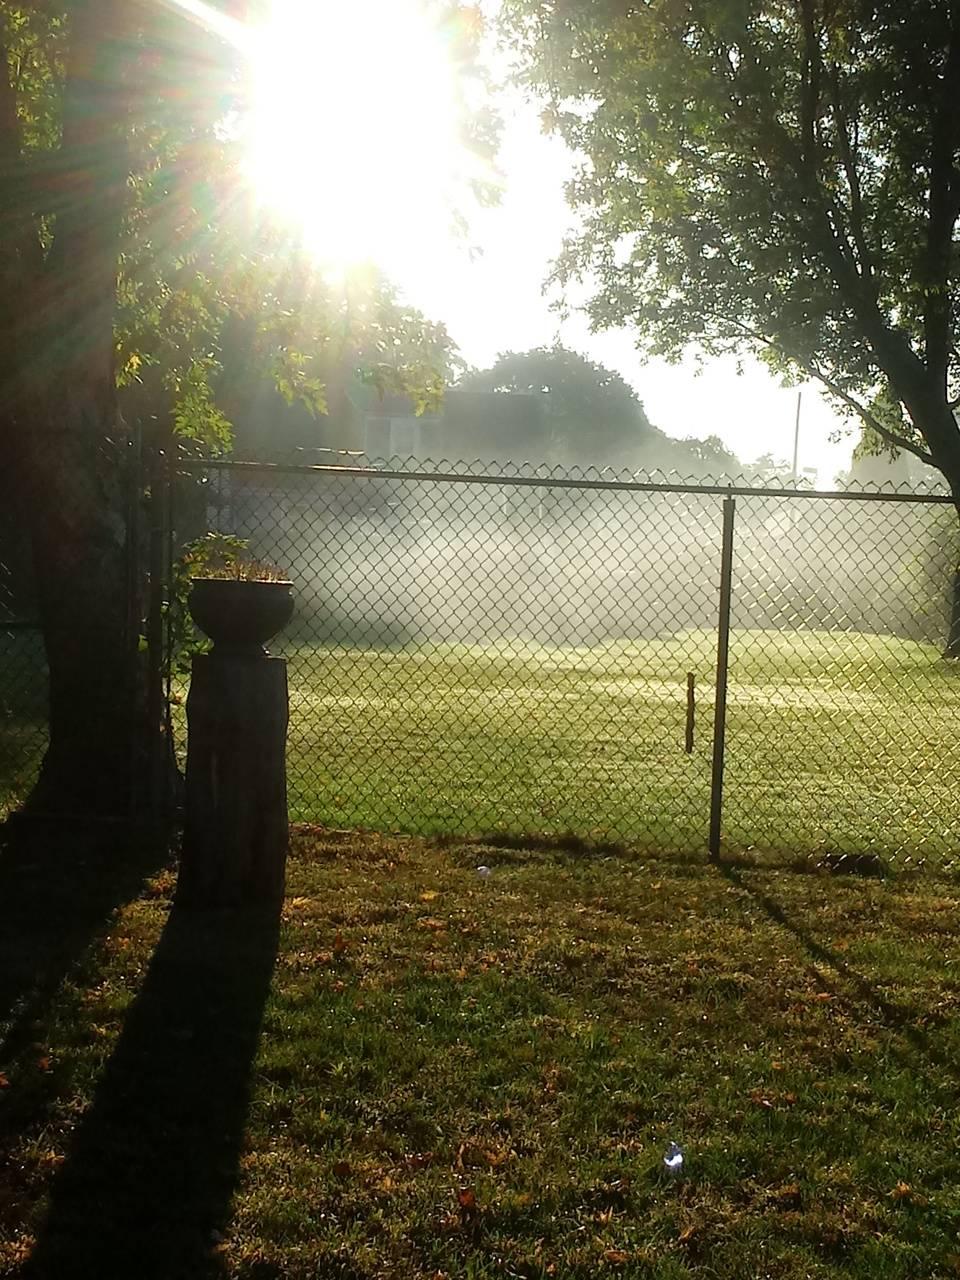 Mist beautiful